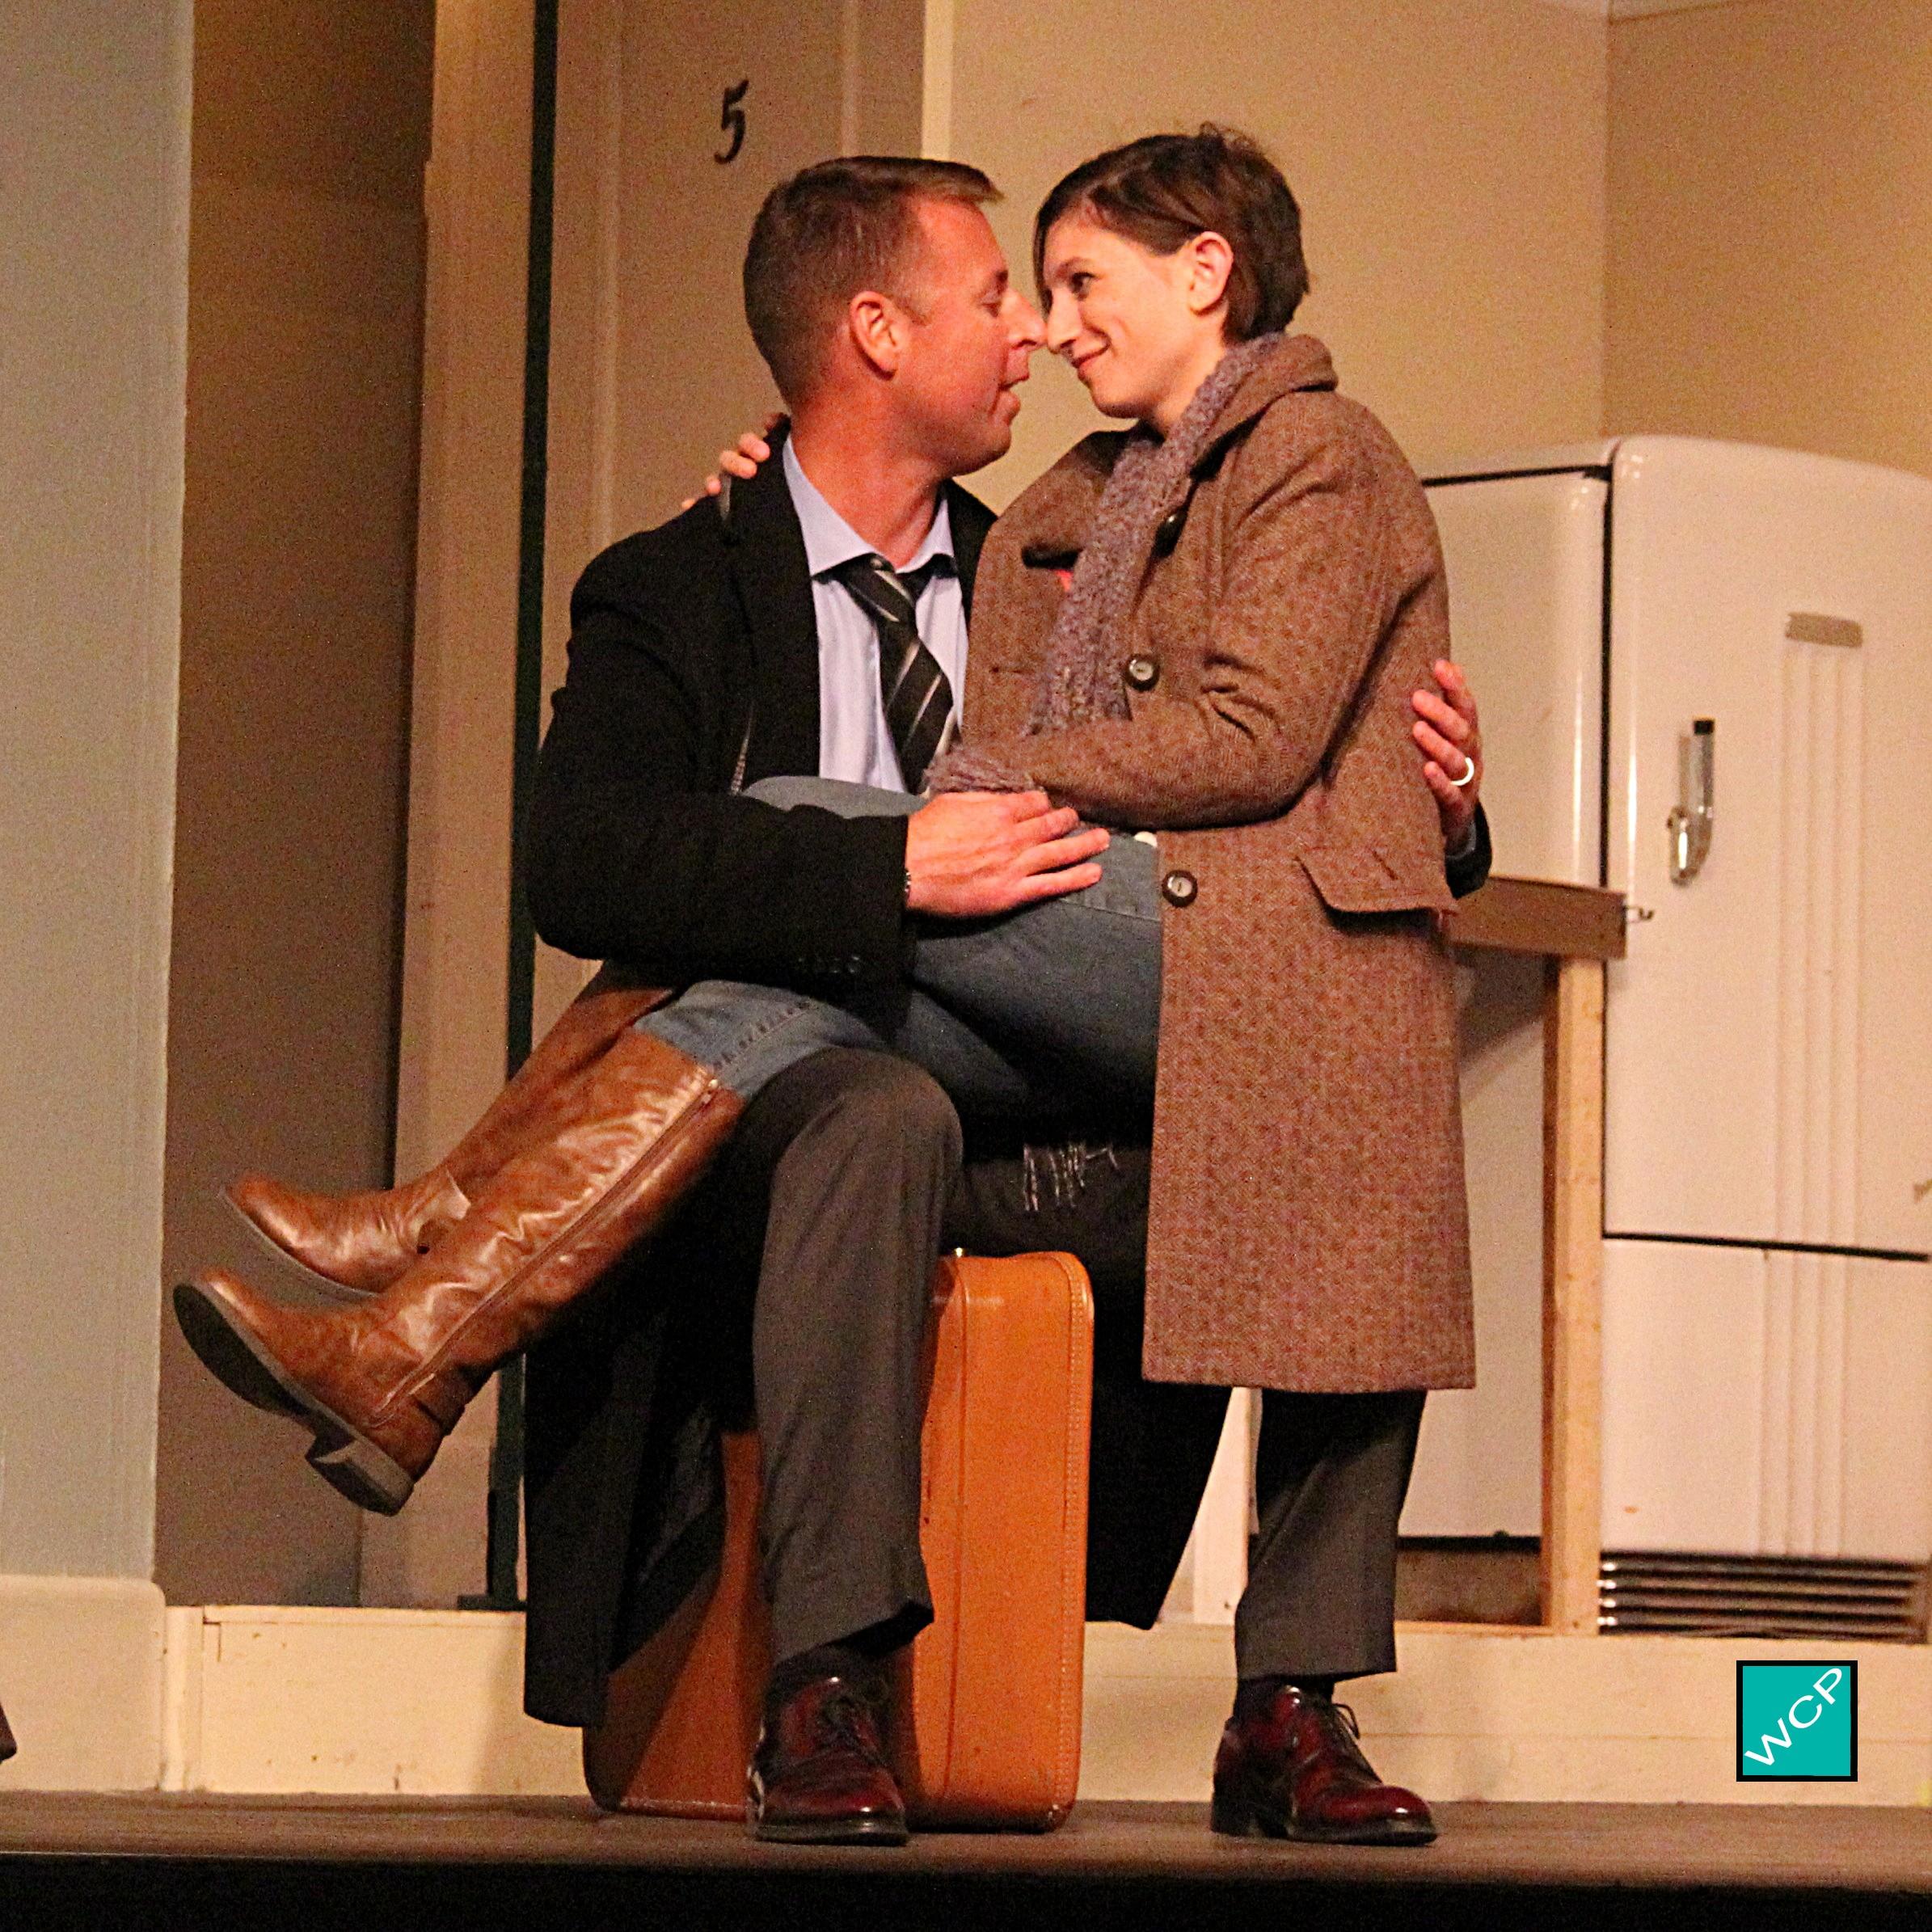 [l-r] Brian Remo as Paul, Debbie Campanali as Corie